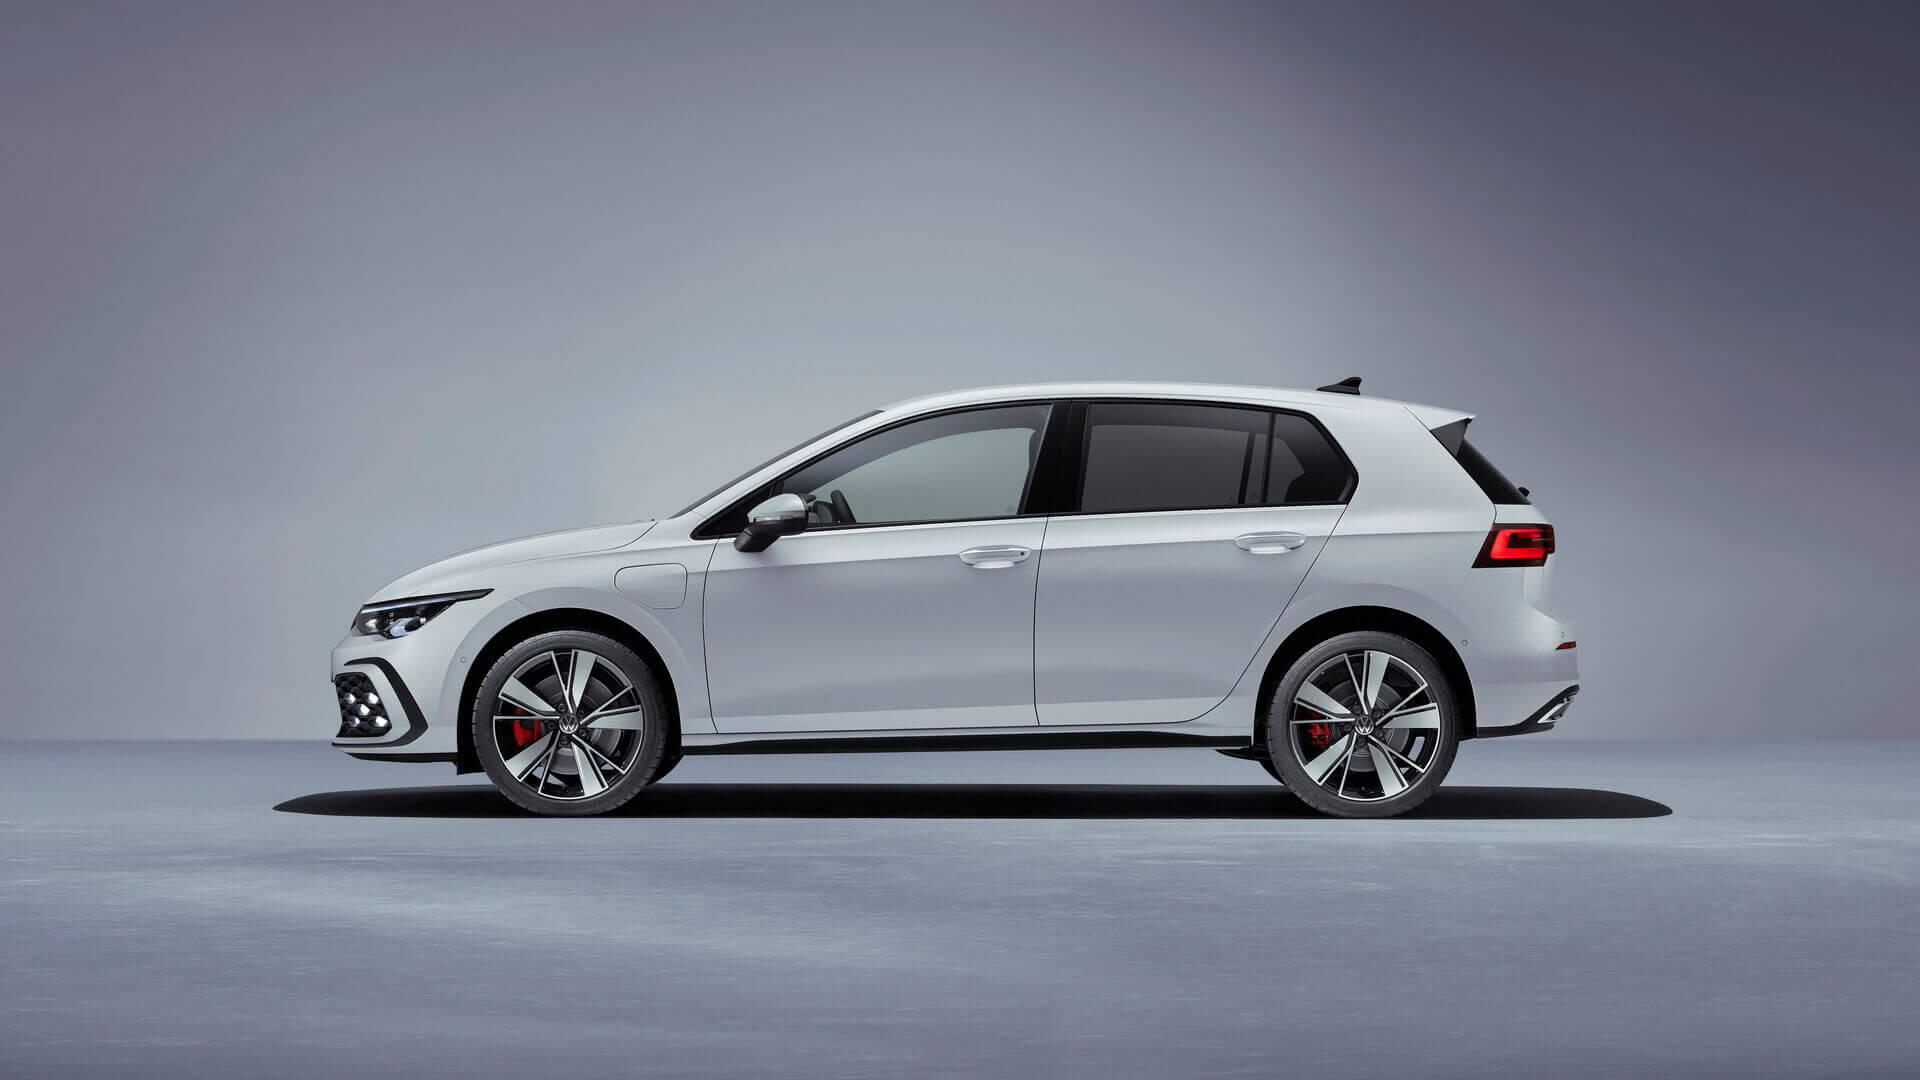 Плагин-гибрид Volkswagen Golf GTE 2020